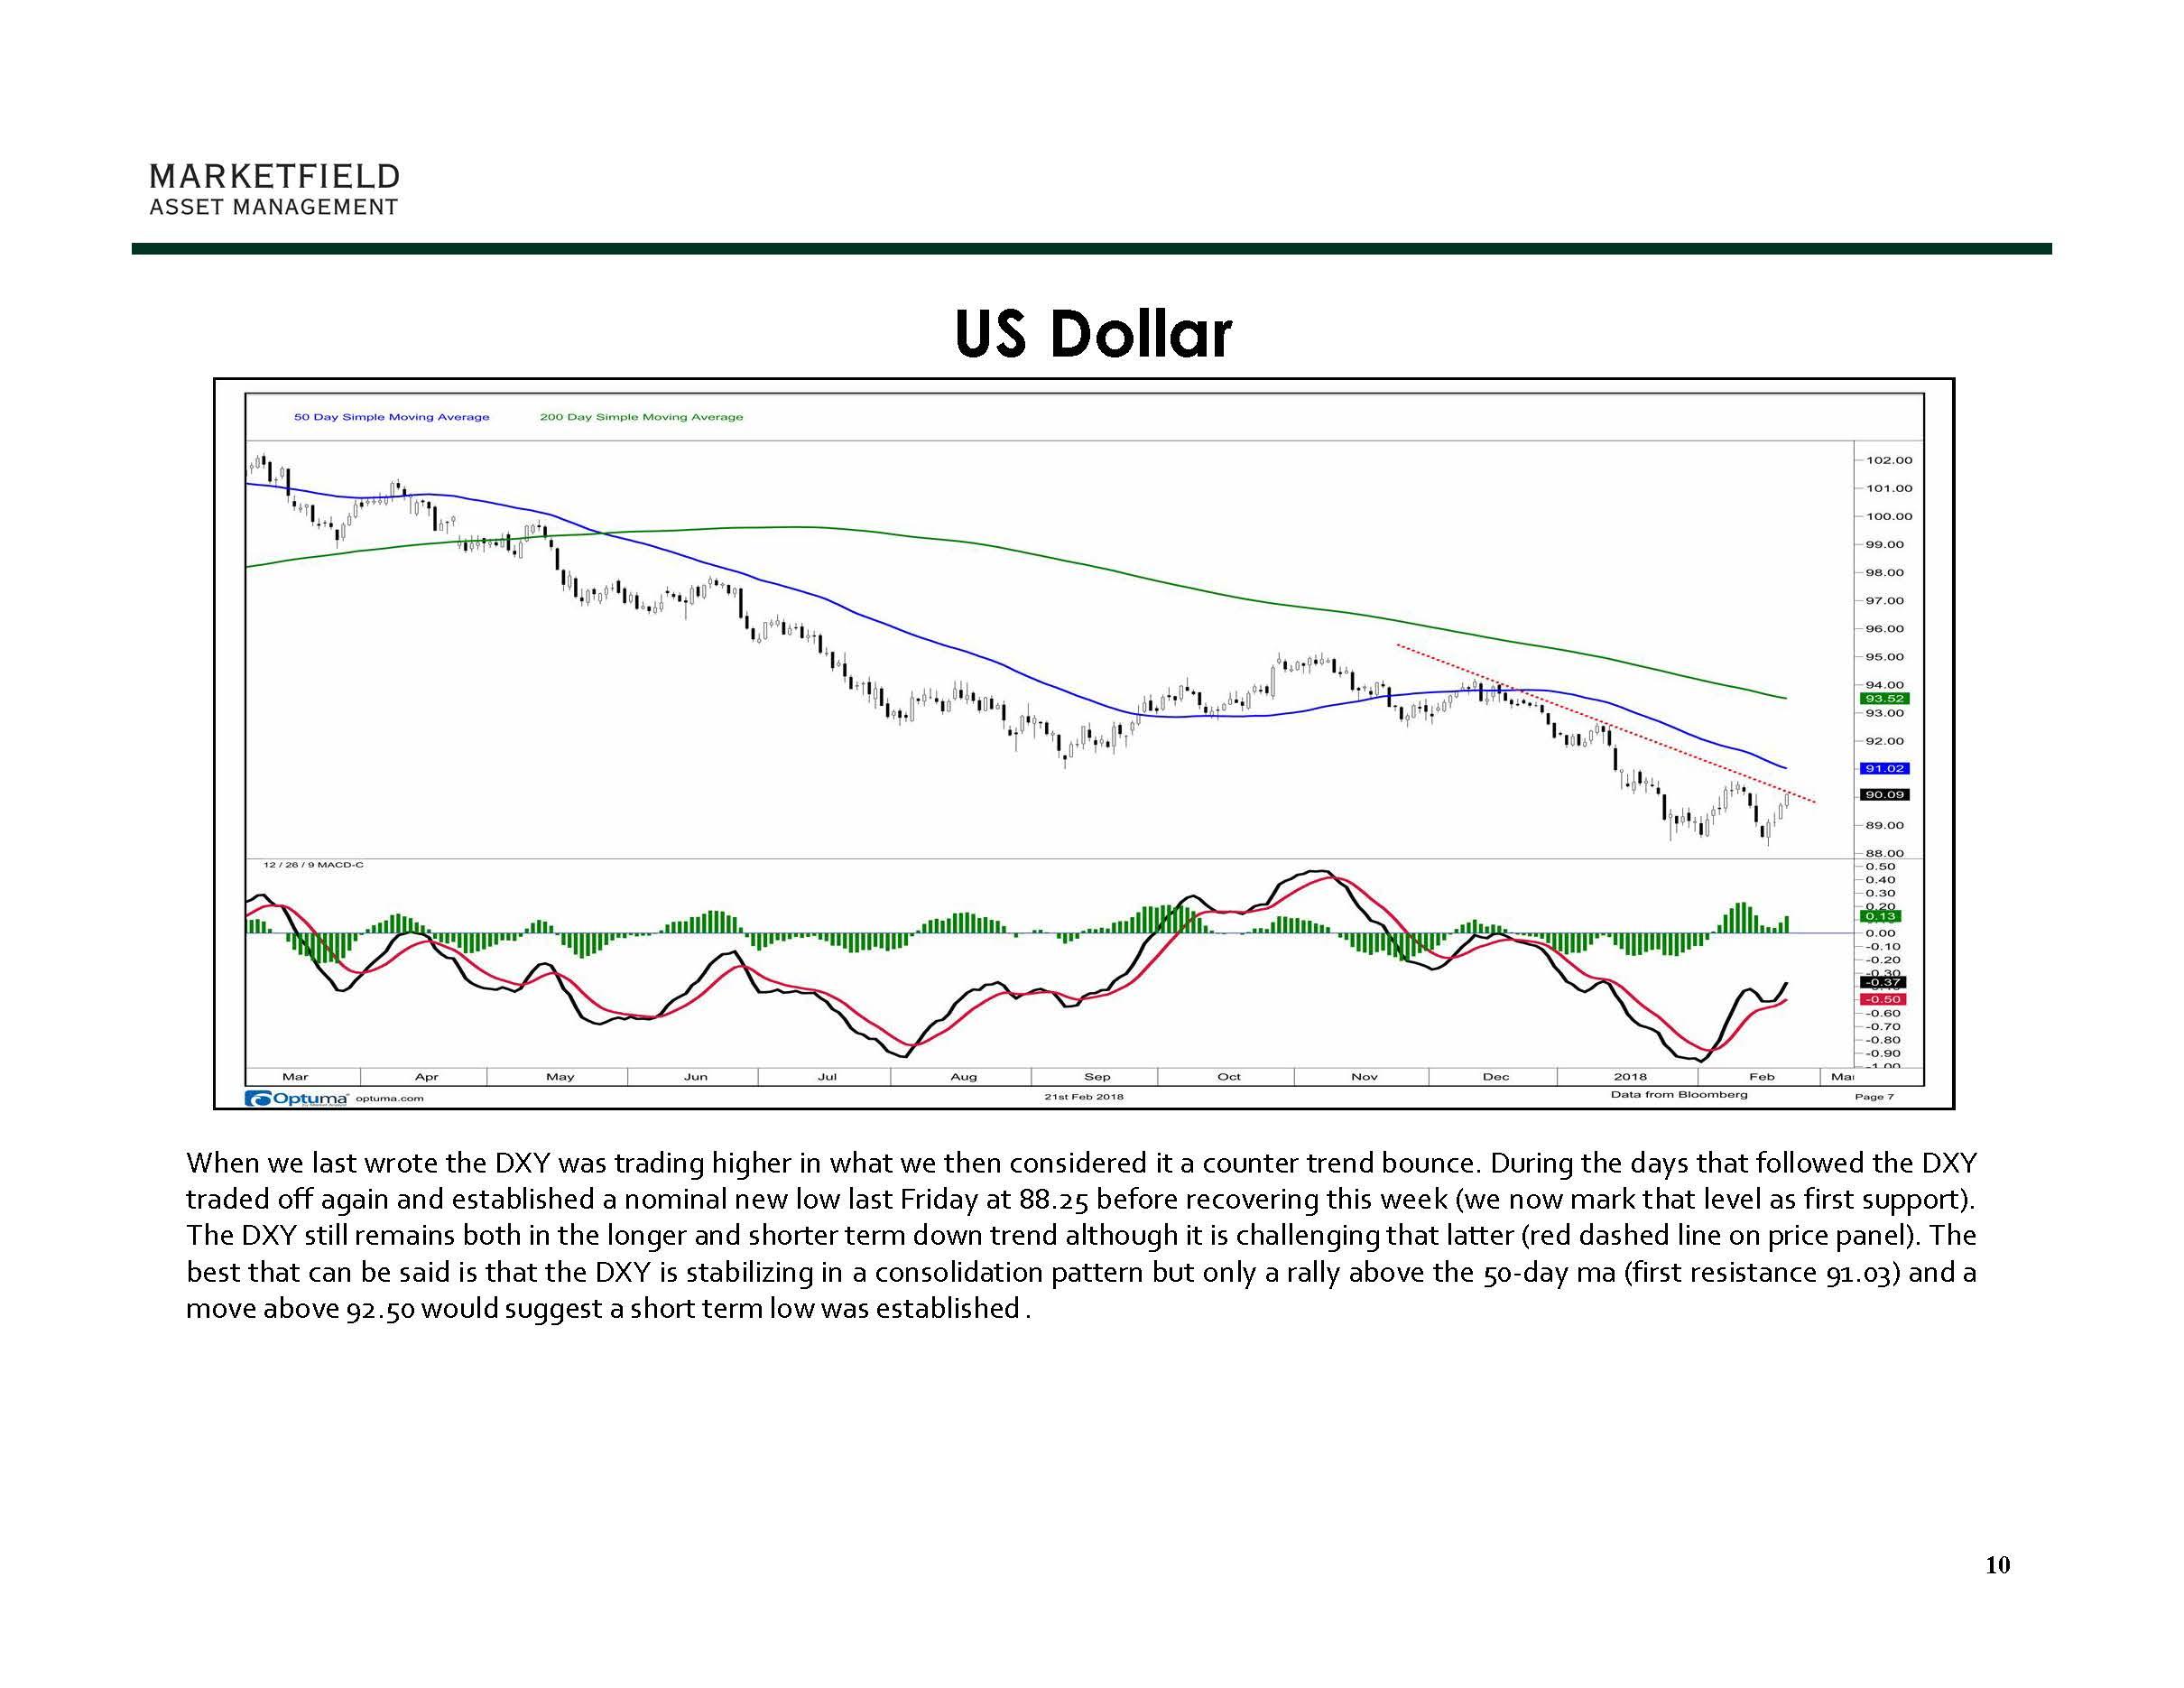 Marketfield Weekly Speculator 02-22-18_Page_10.jpg